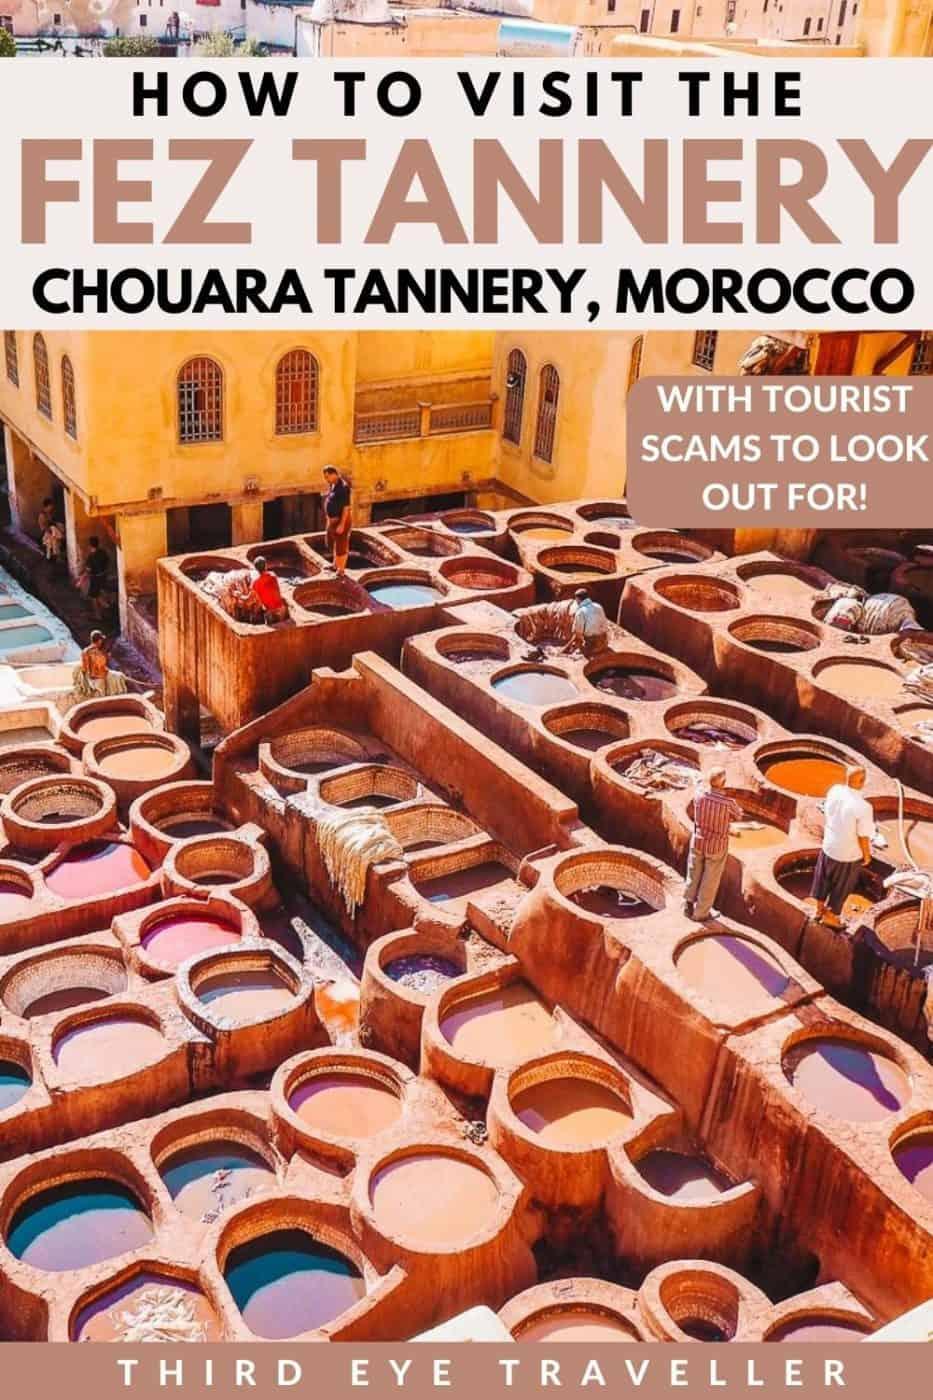 Fez Tannery Chouara Tannery Morocco